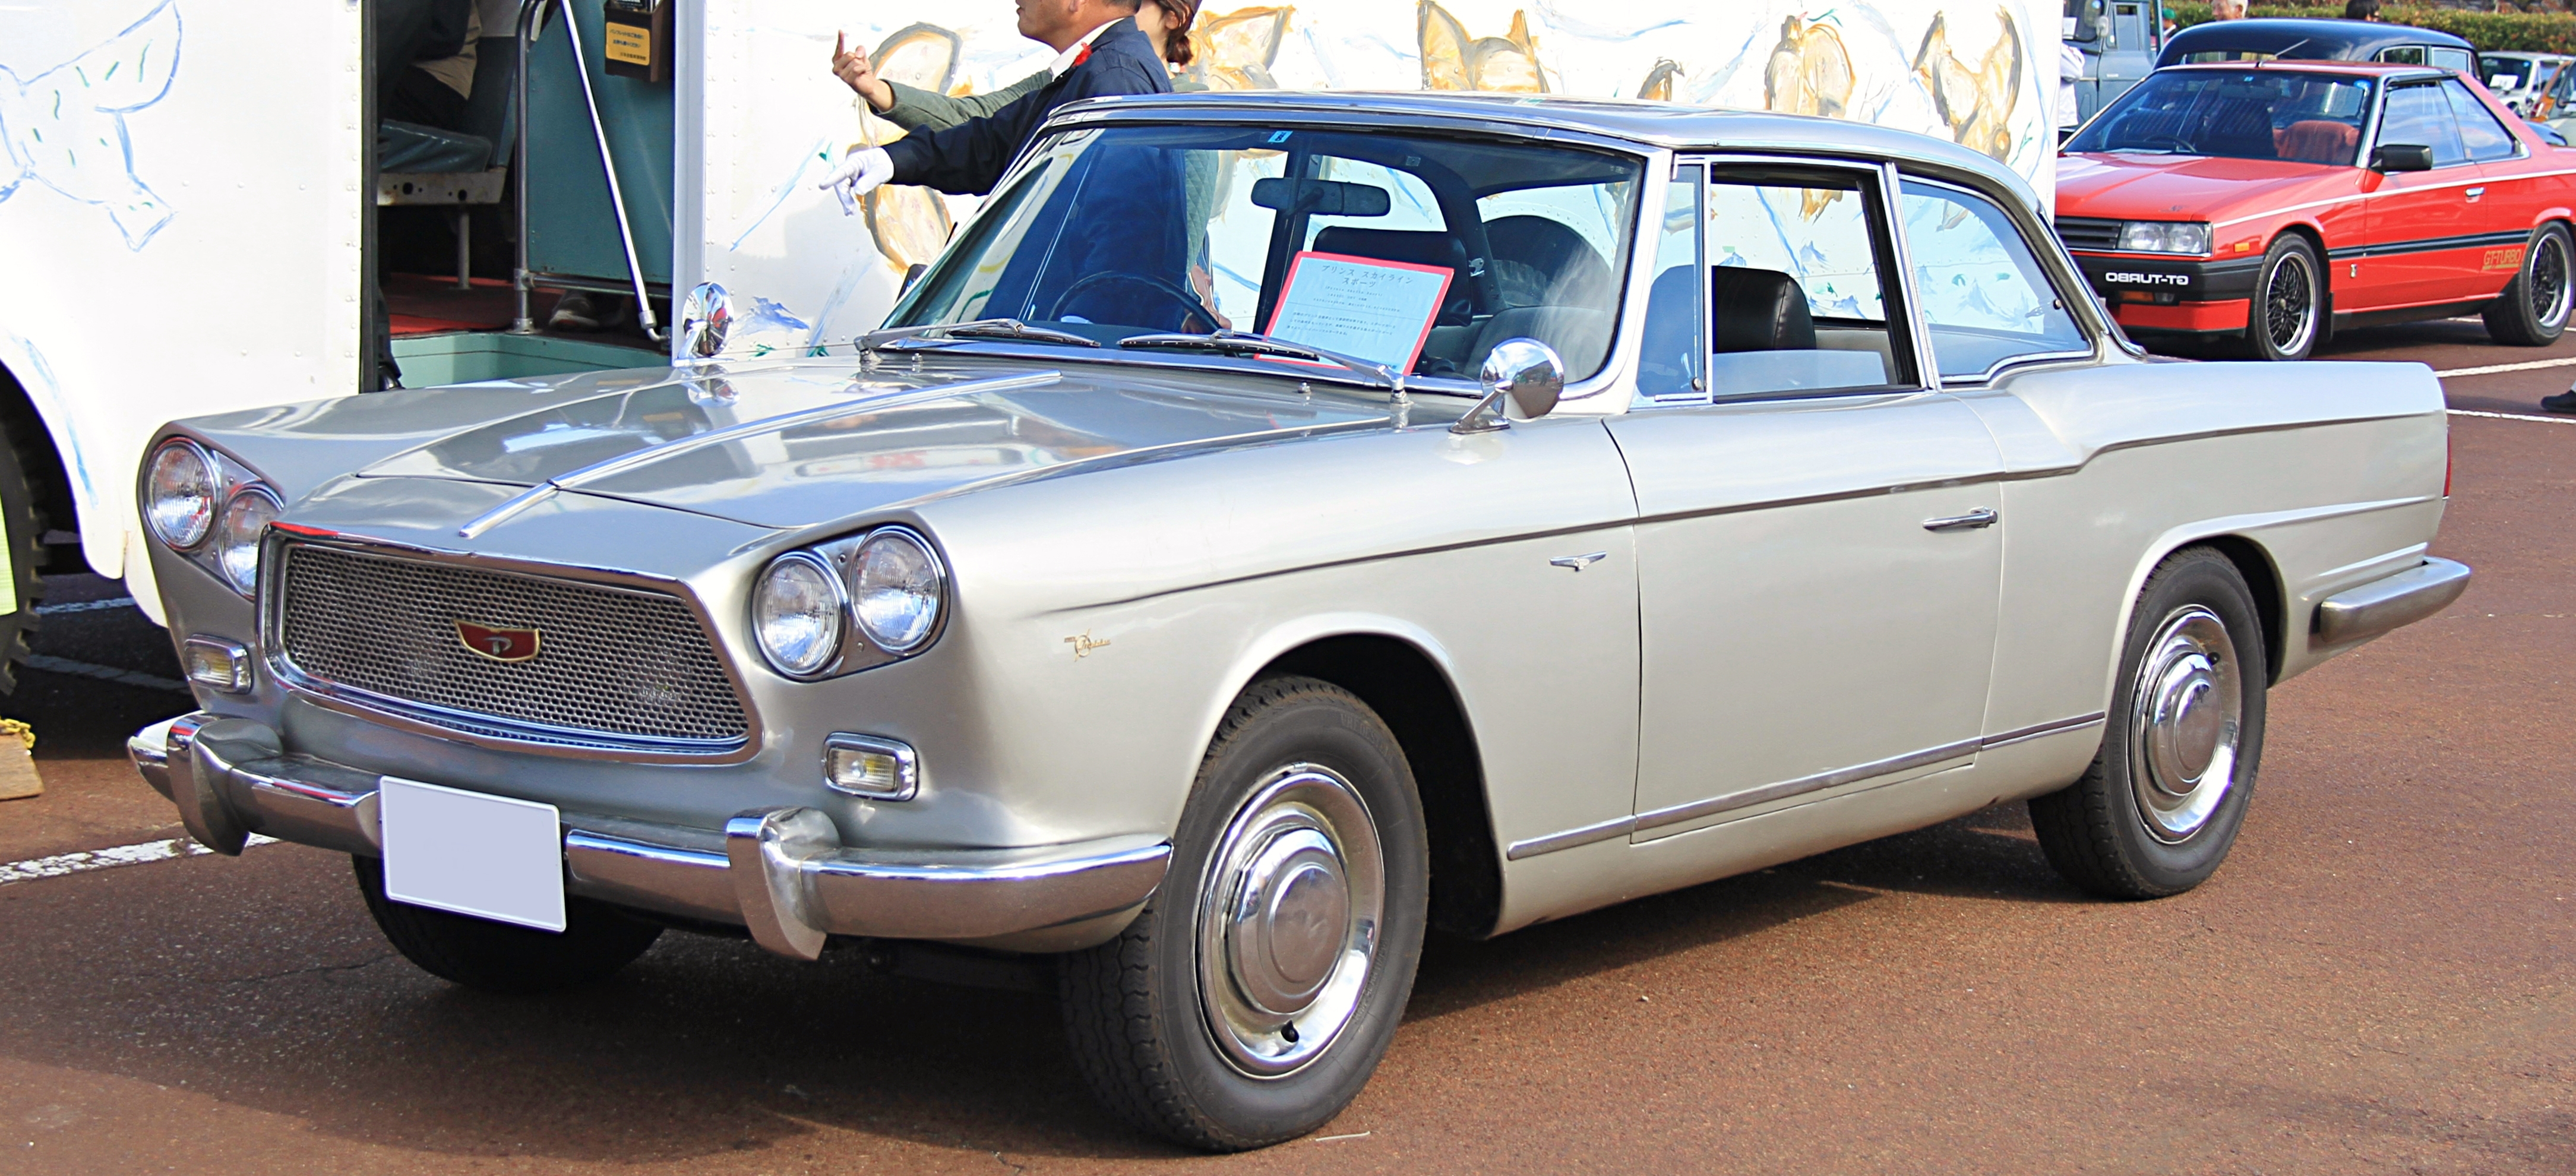 1962_Prince_Skyline_Sport_Coupe.jpg